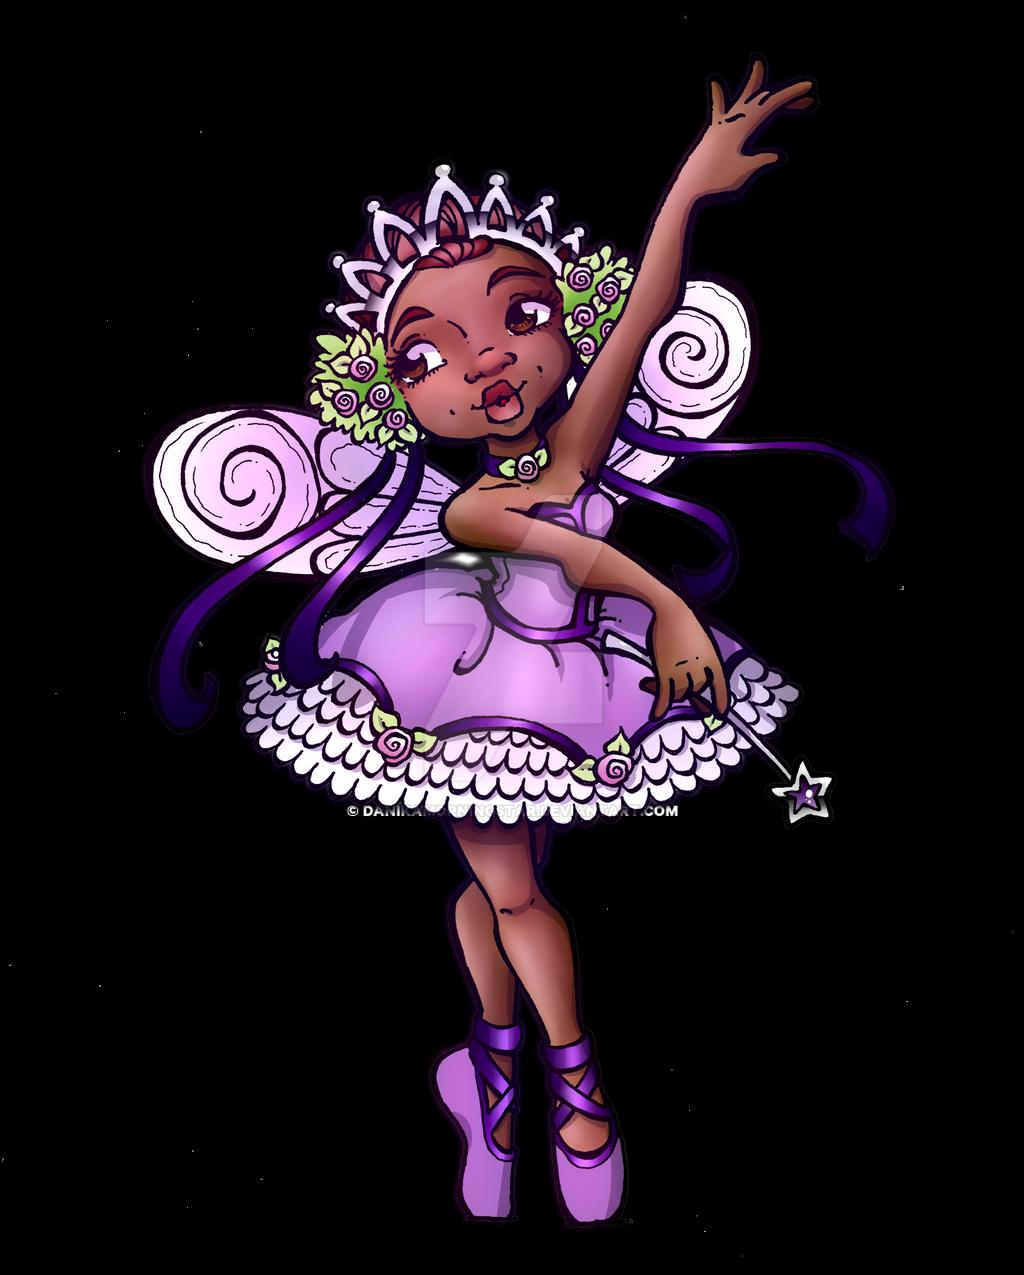 Sugar plum fairy porn nudes girl